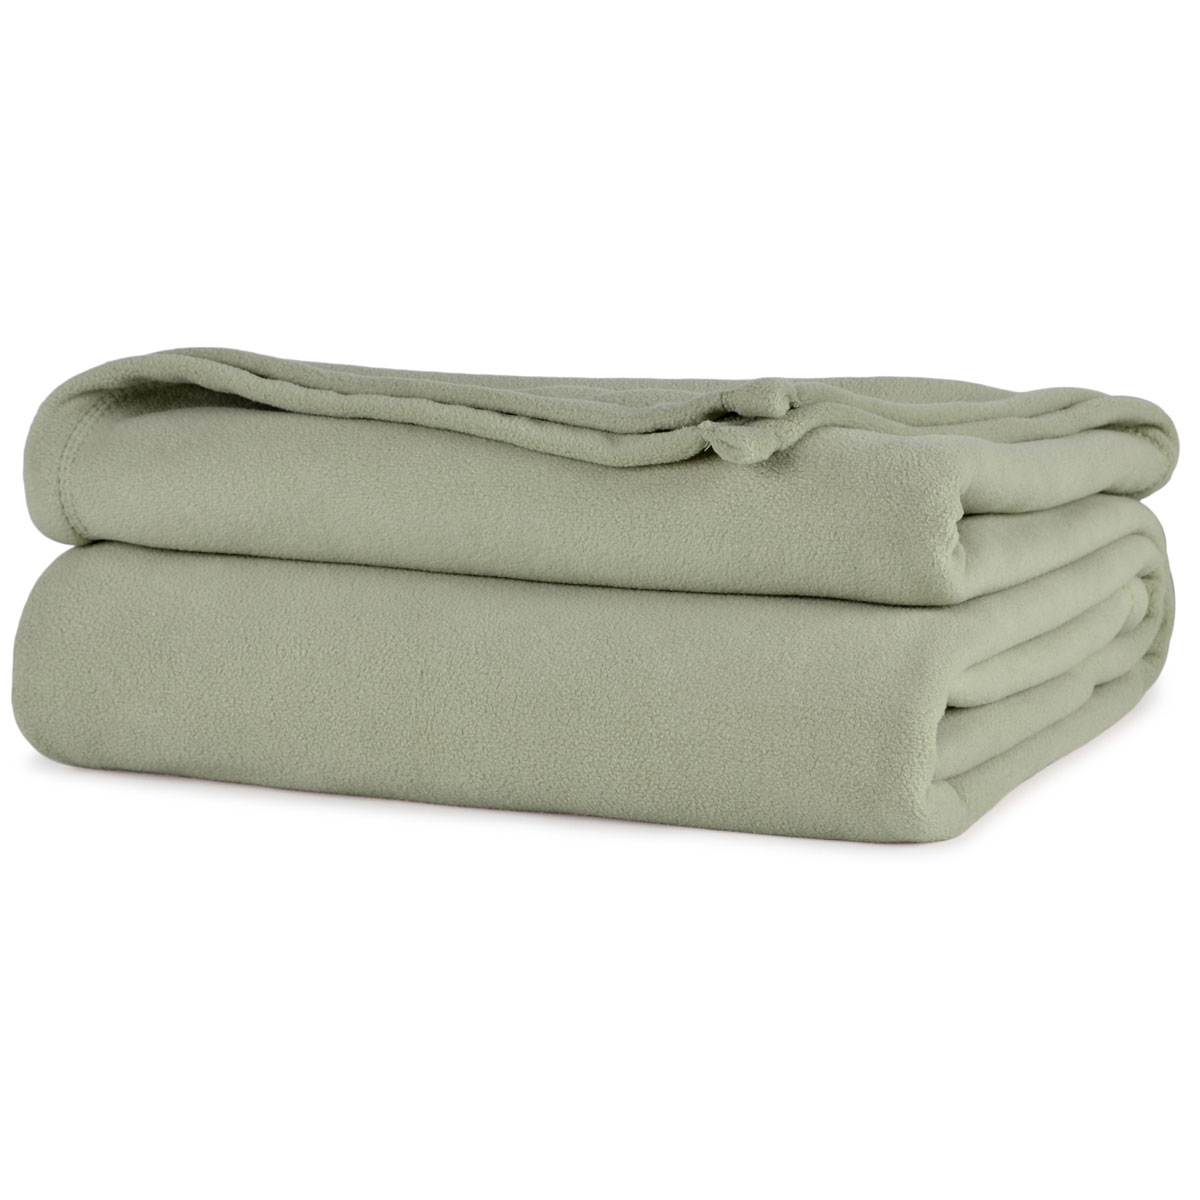 Berkshire Microloft Blanket 240 Gsm Full Queen 90x90 12